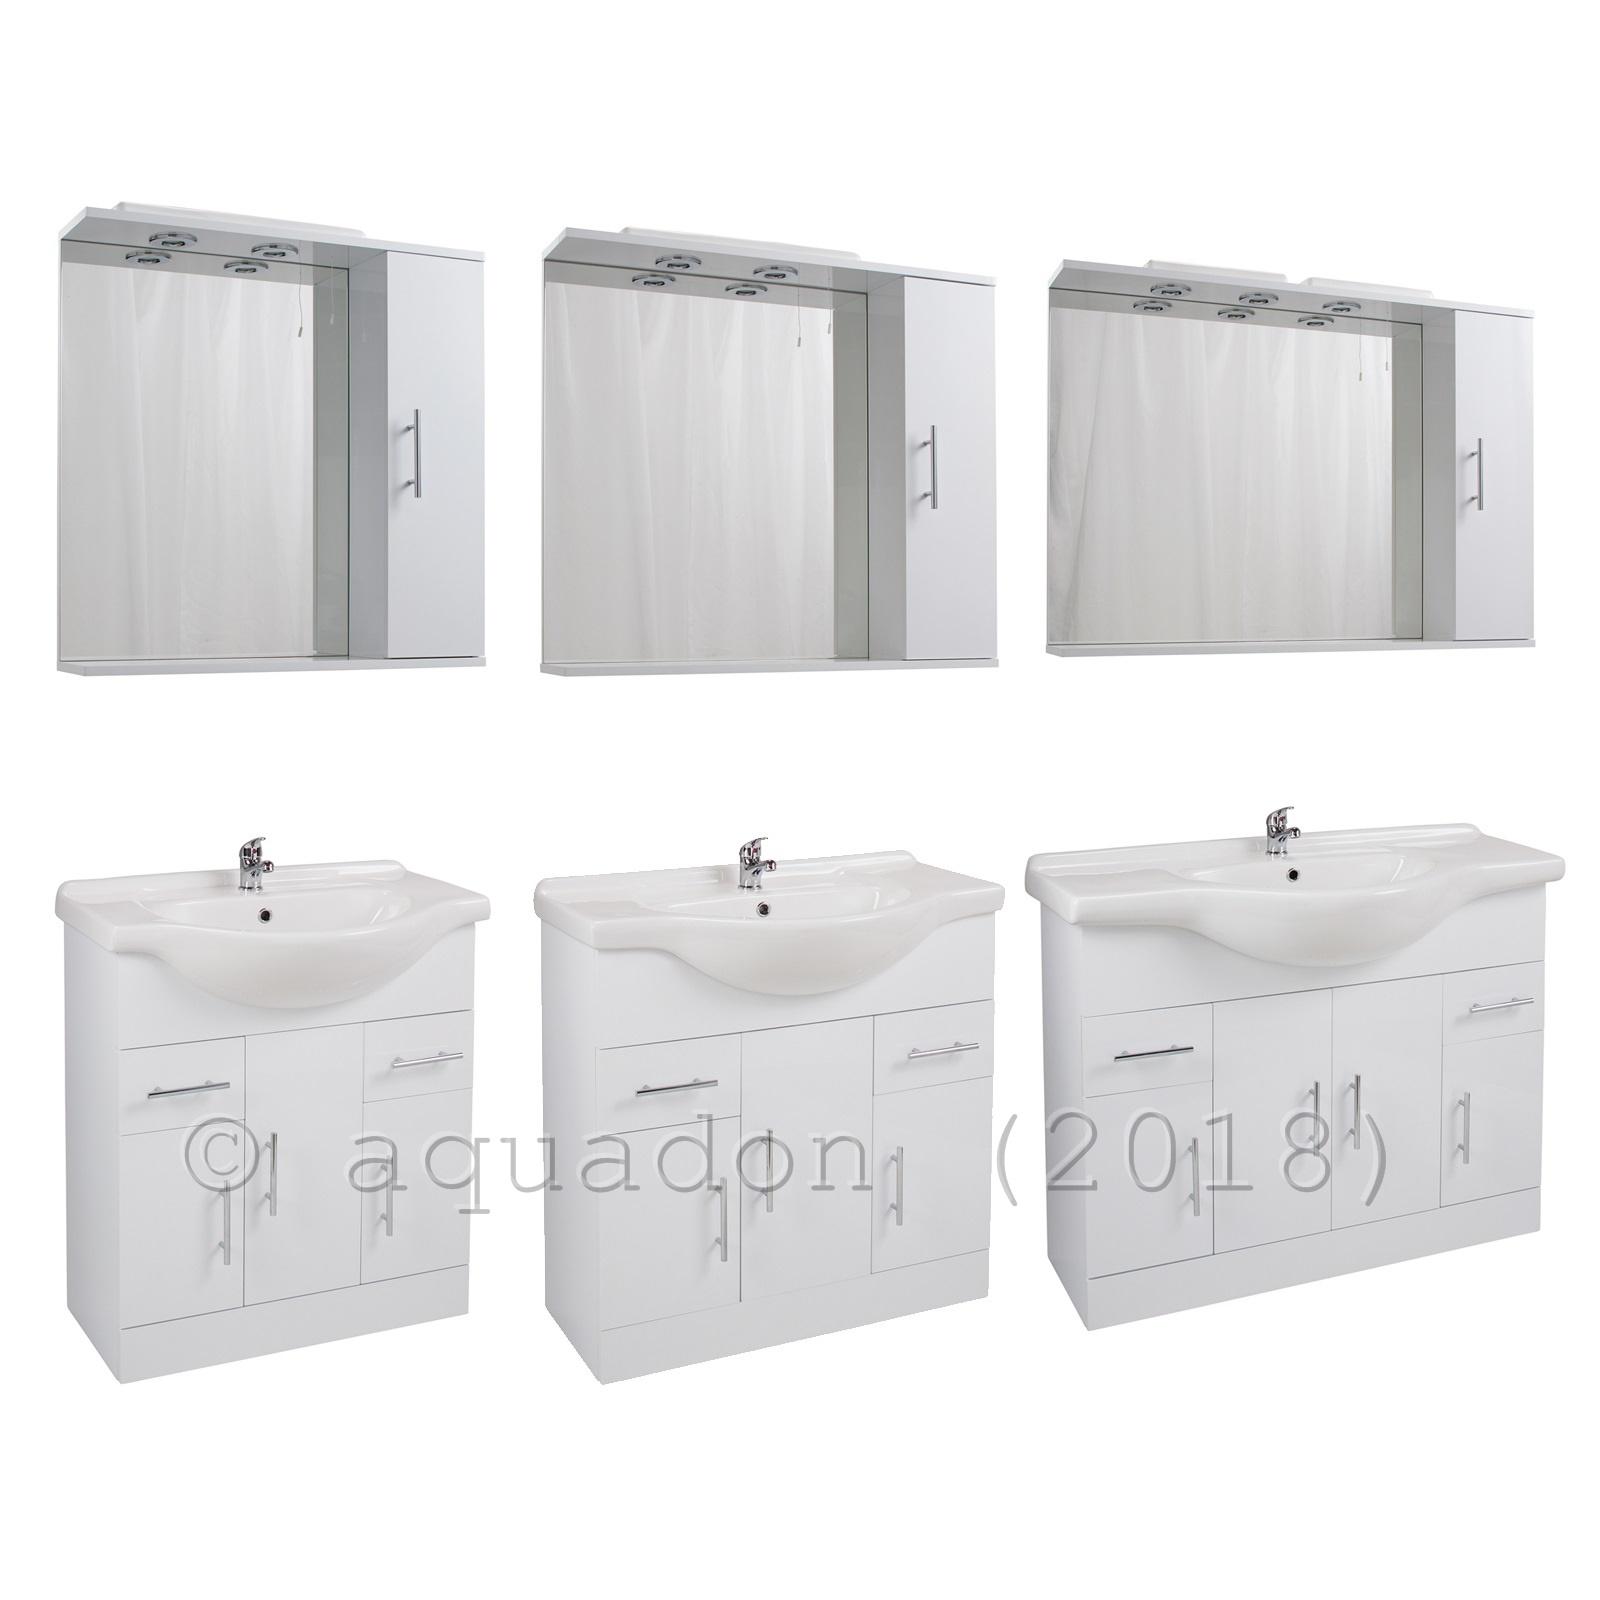 Bathroom Vanity Unit Furniture Gloss White, Illuminated Mirror Cabinet Option